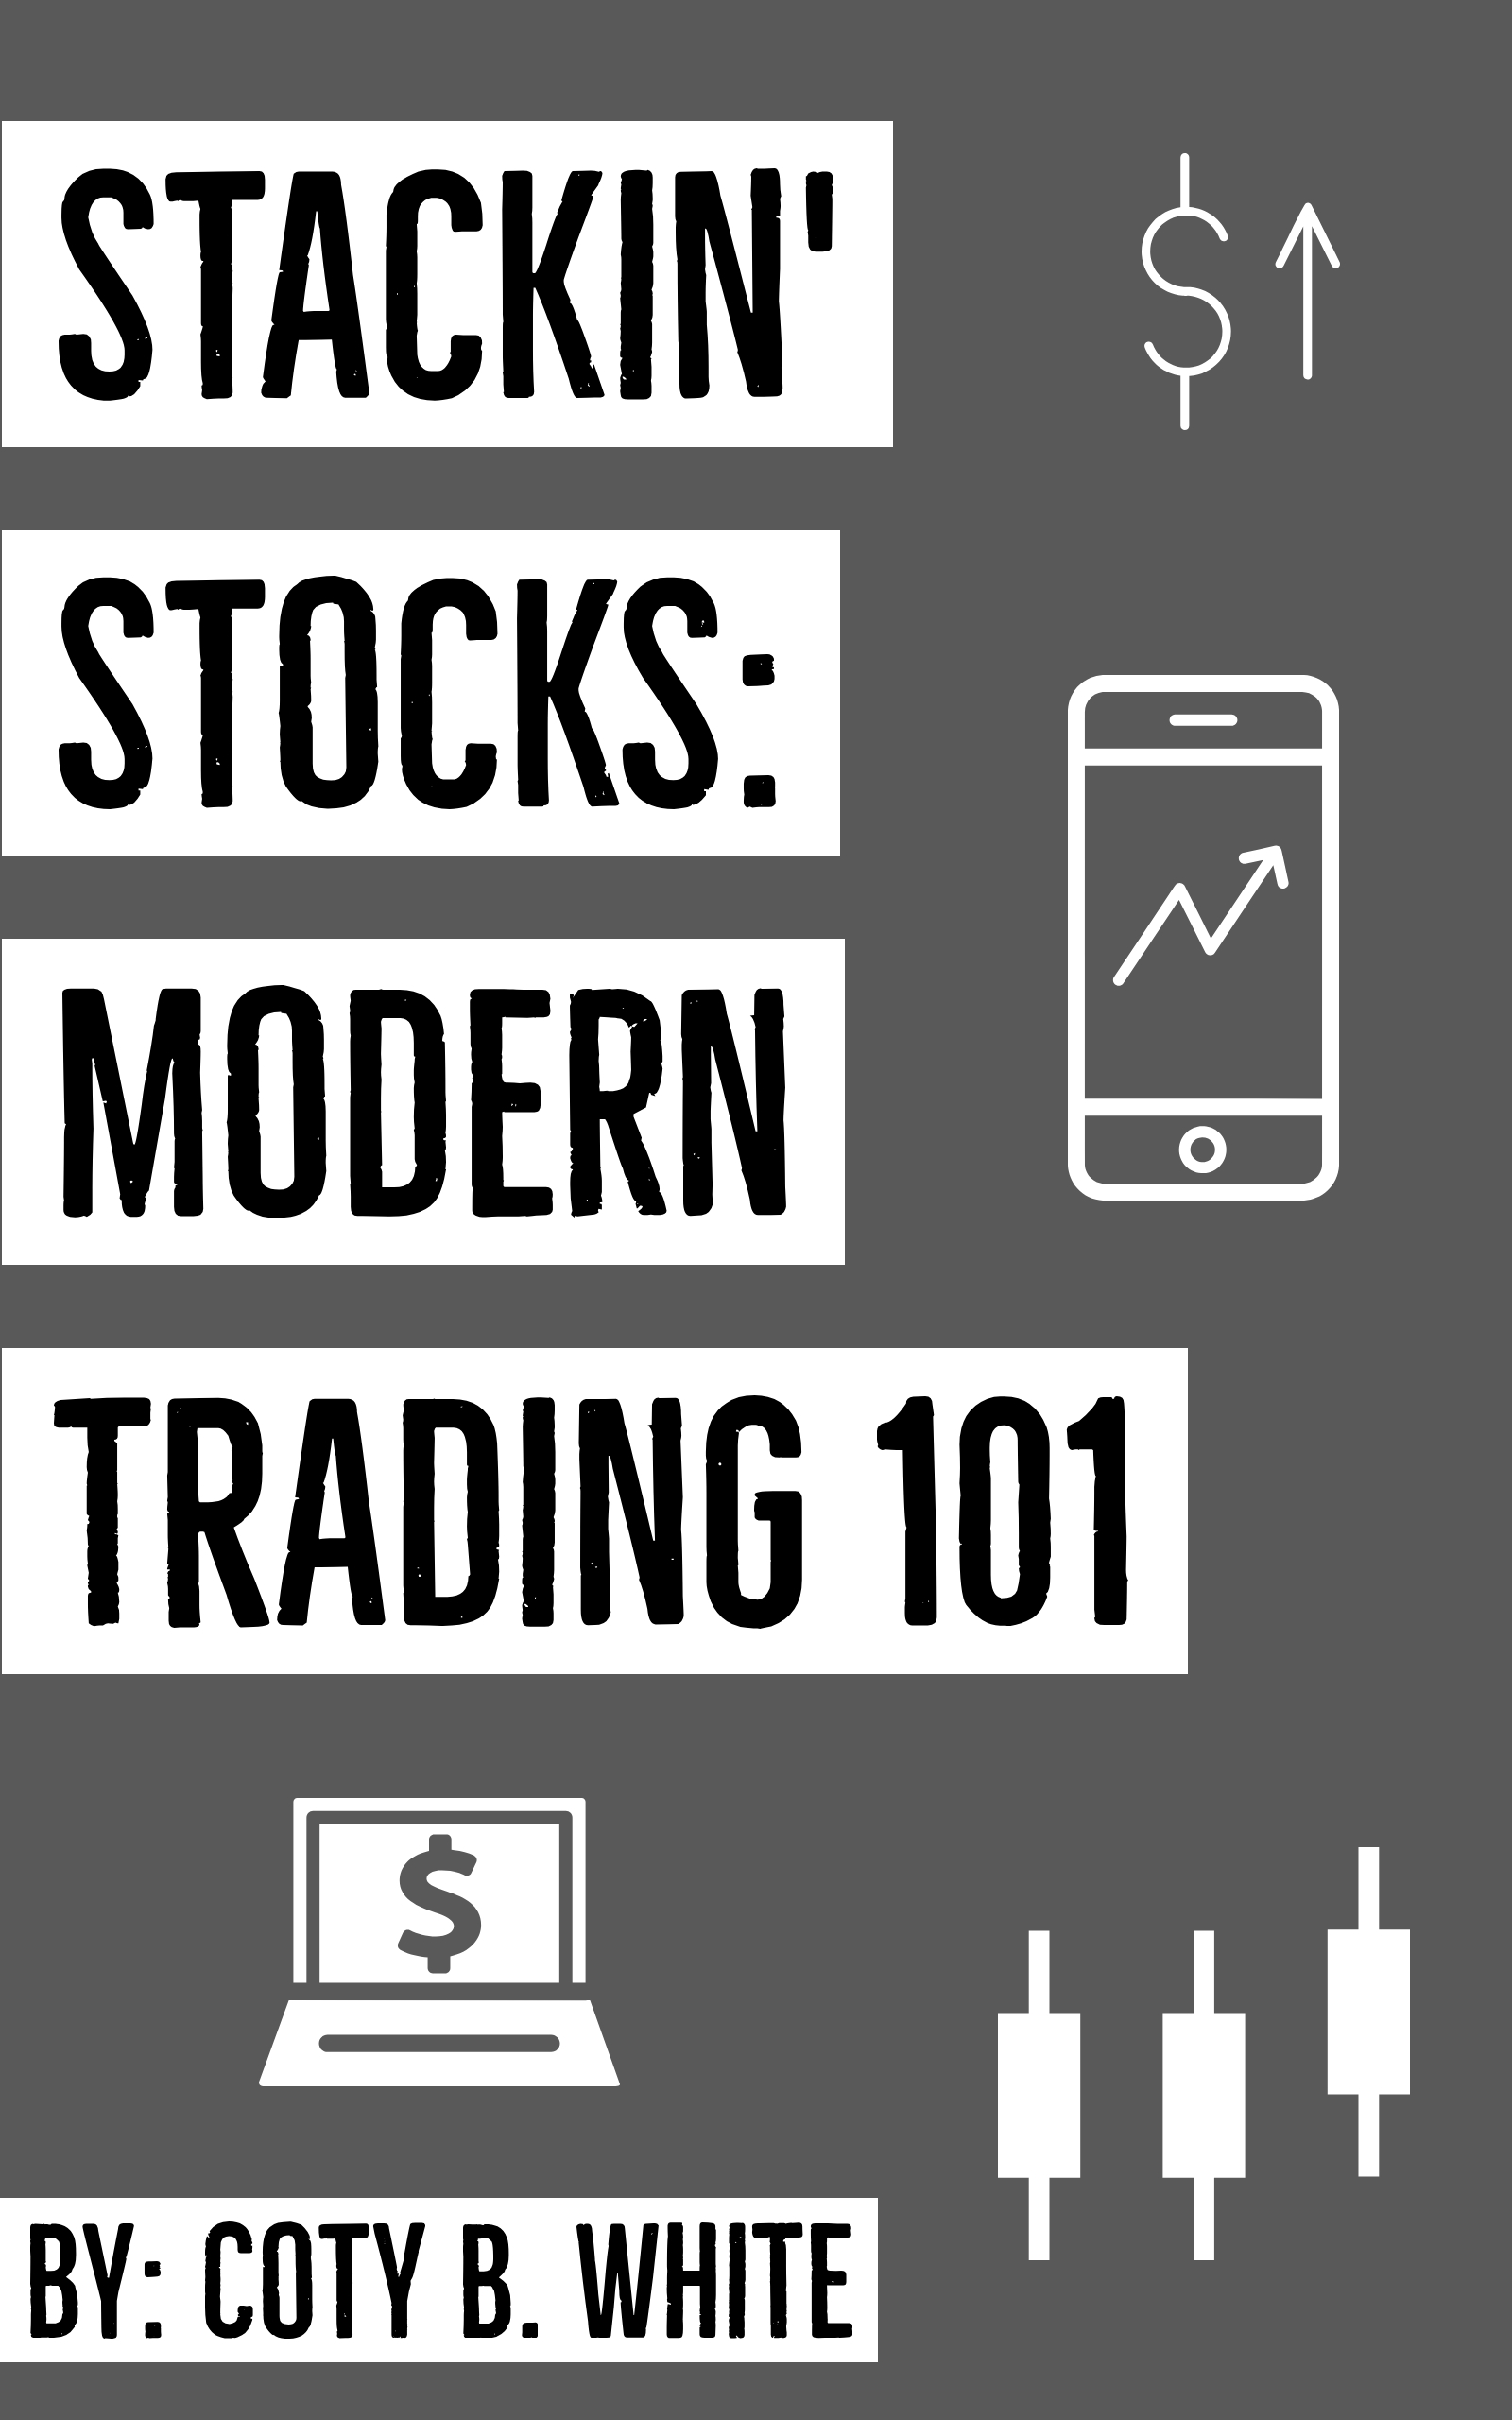 StackinStocksModernTrading101